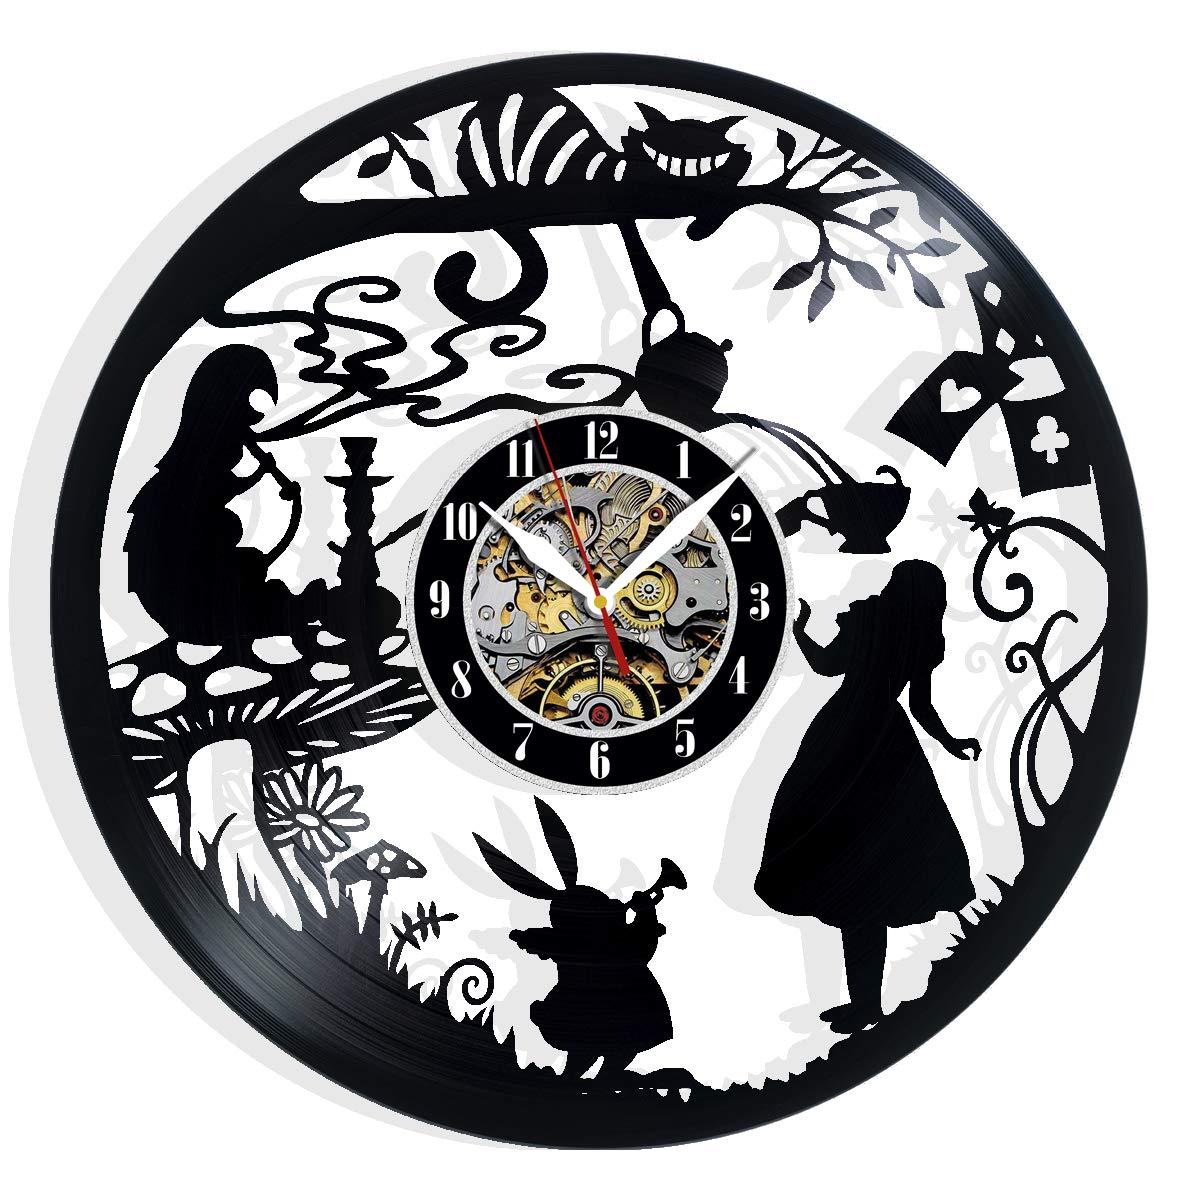 Alice in Wonderland Vinyl Record Wall Clock Art Home Decor Interior Design Best Gift for Fans Room Wall Art